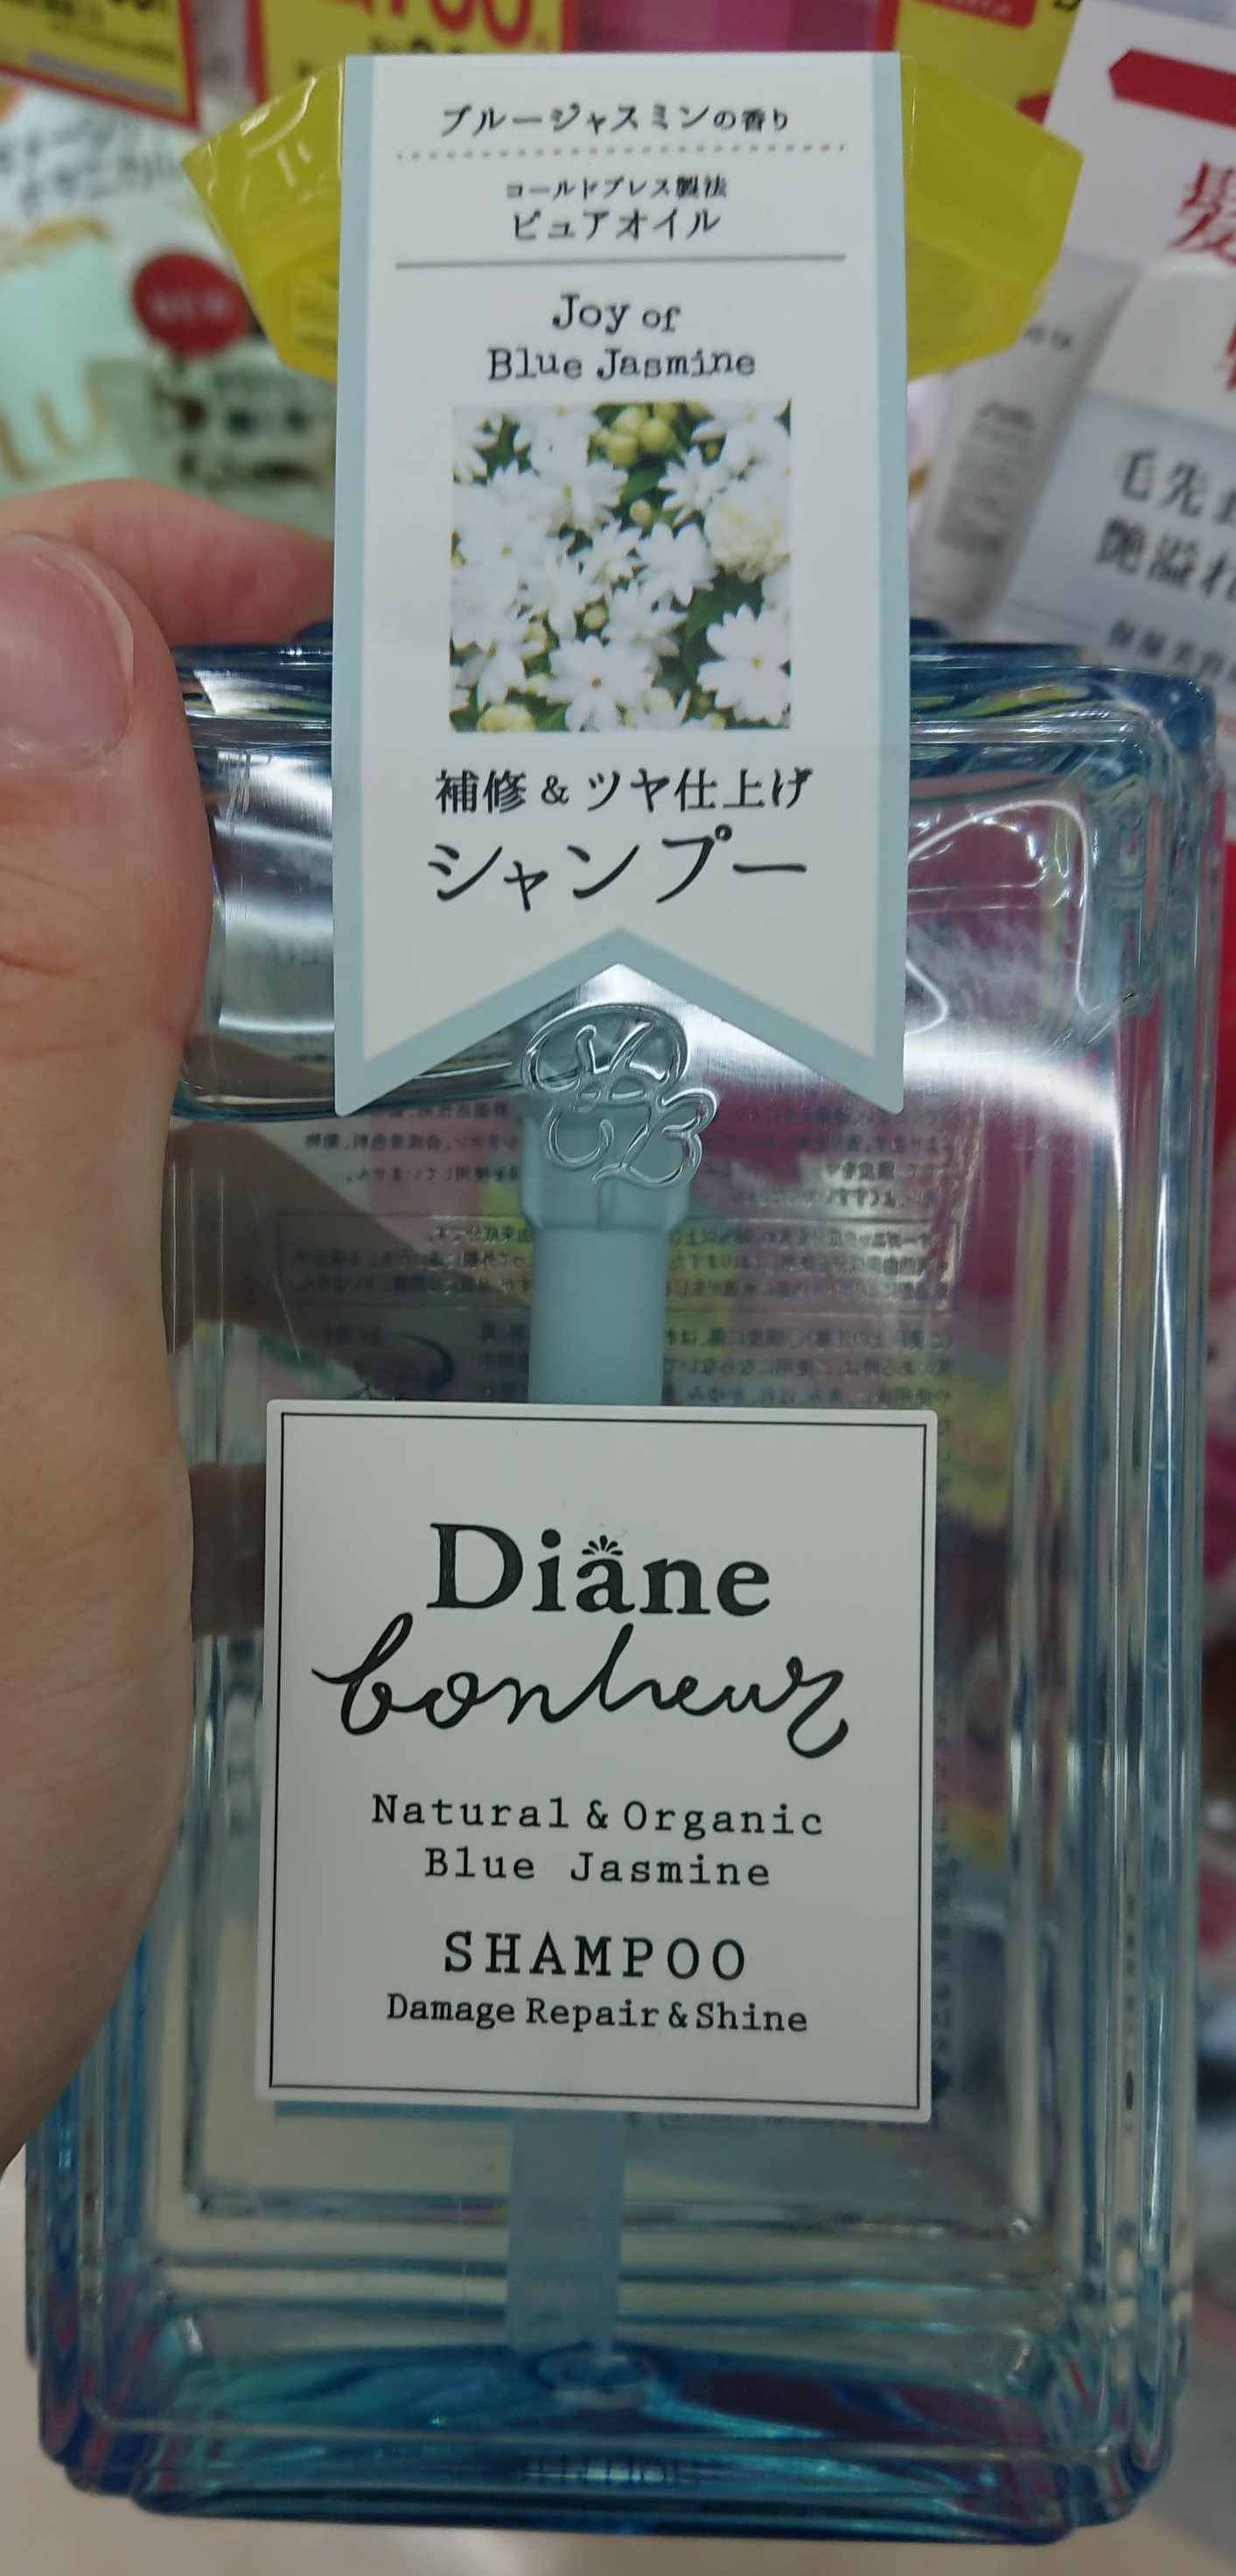 Diane Bonheur Blue Jasmine Shampoo, Vegan Society certified